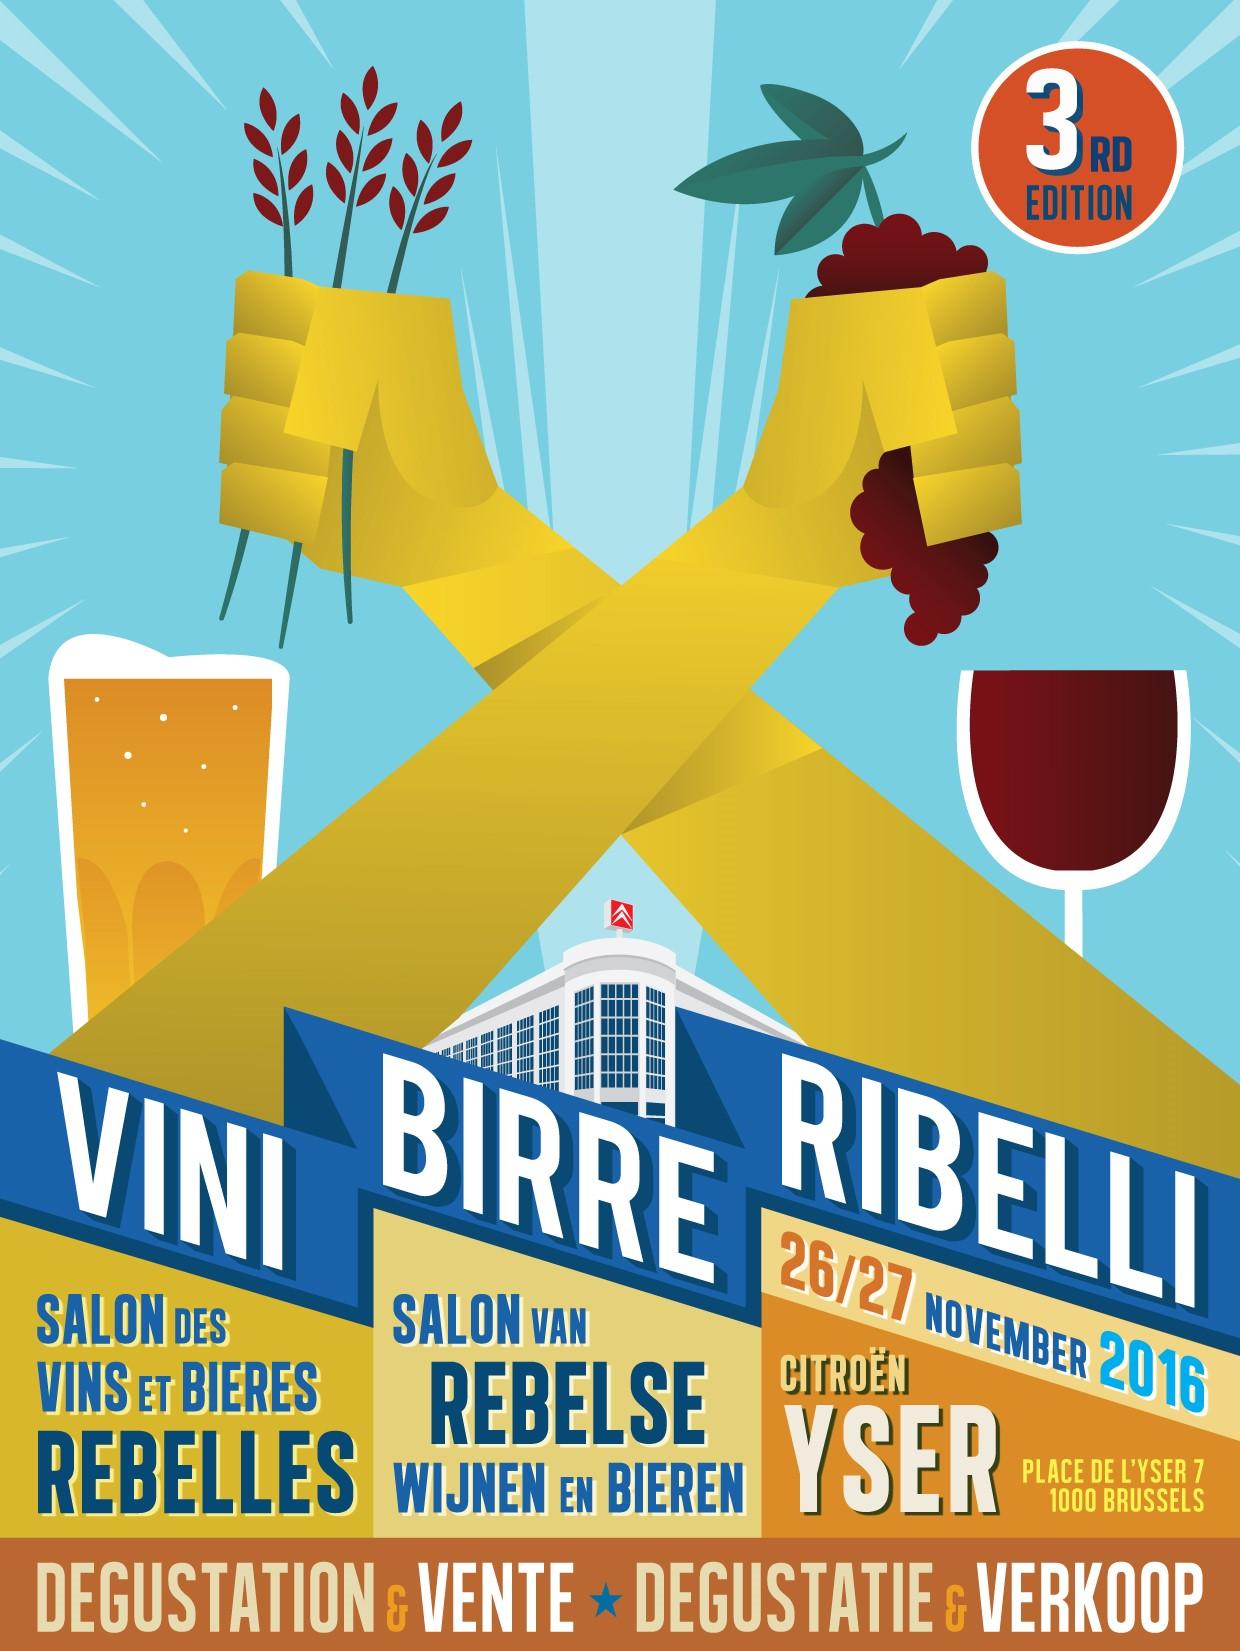 vini-birre-reblli